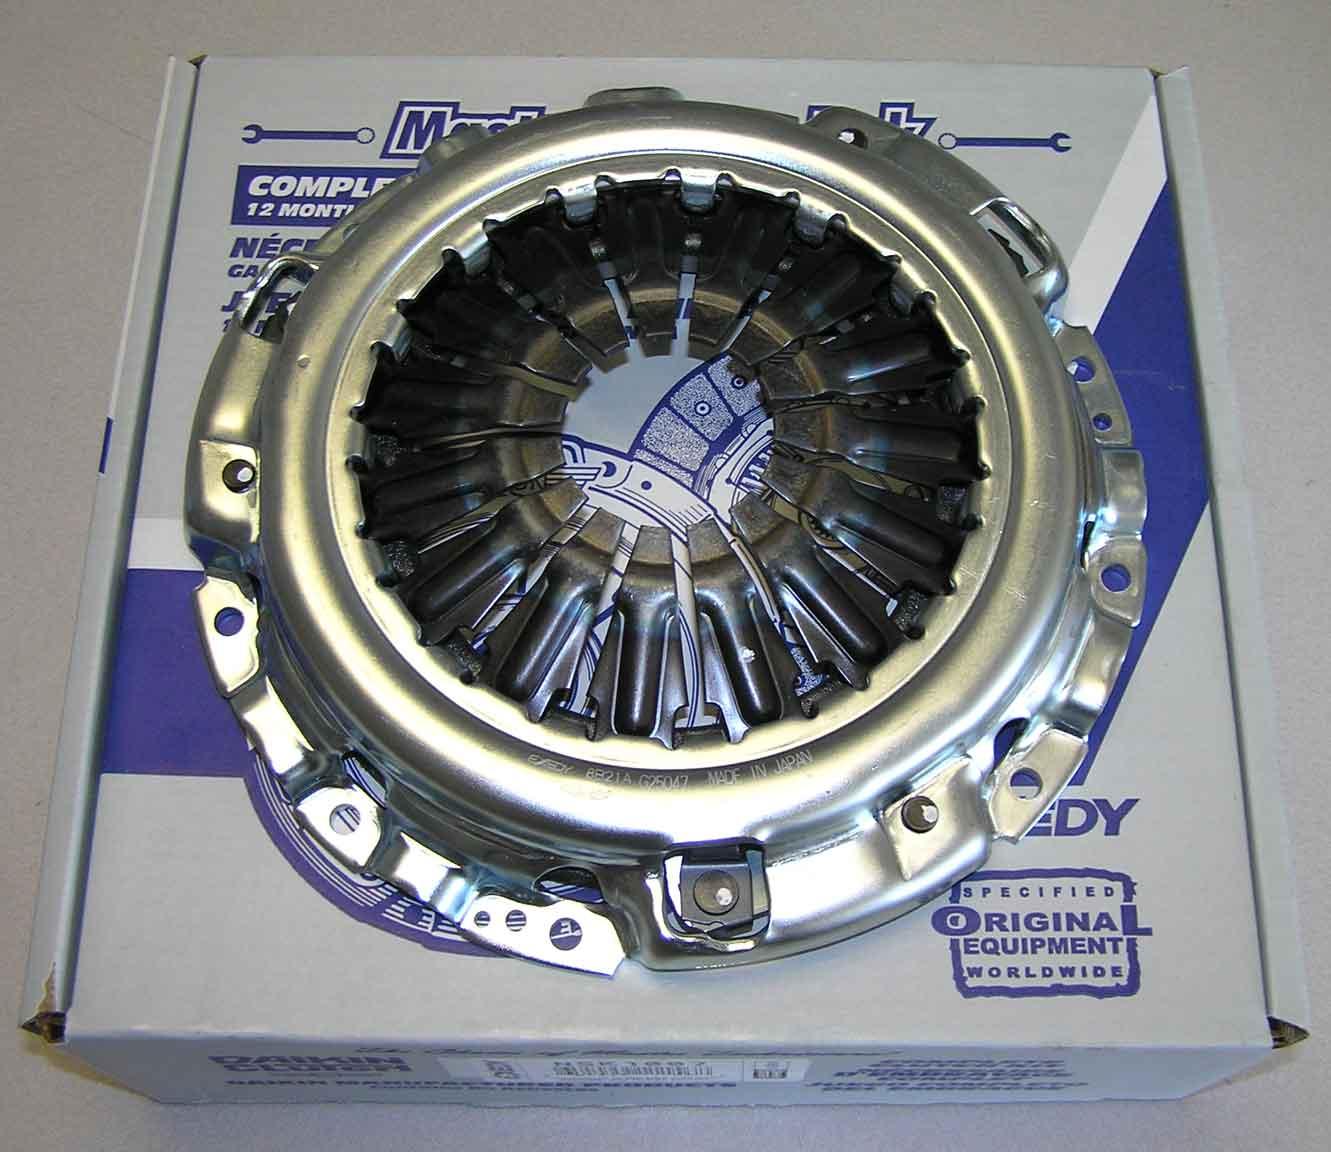 EXEDY DIAKIN CLUTCH KIT Fits 2005-2015 Nissan Frontier Xterra 4.0 VQ40DE NSK1006